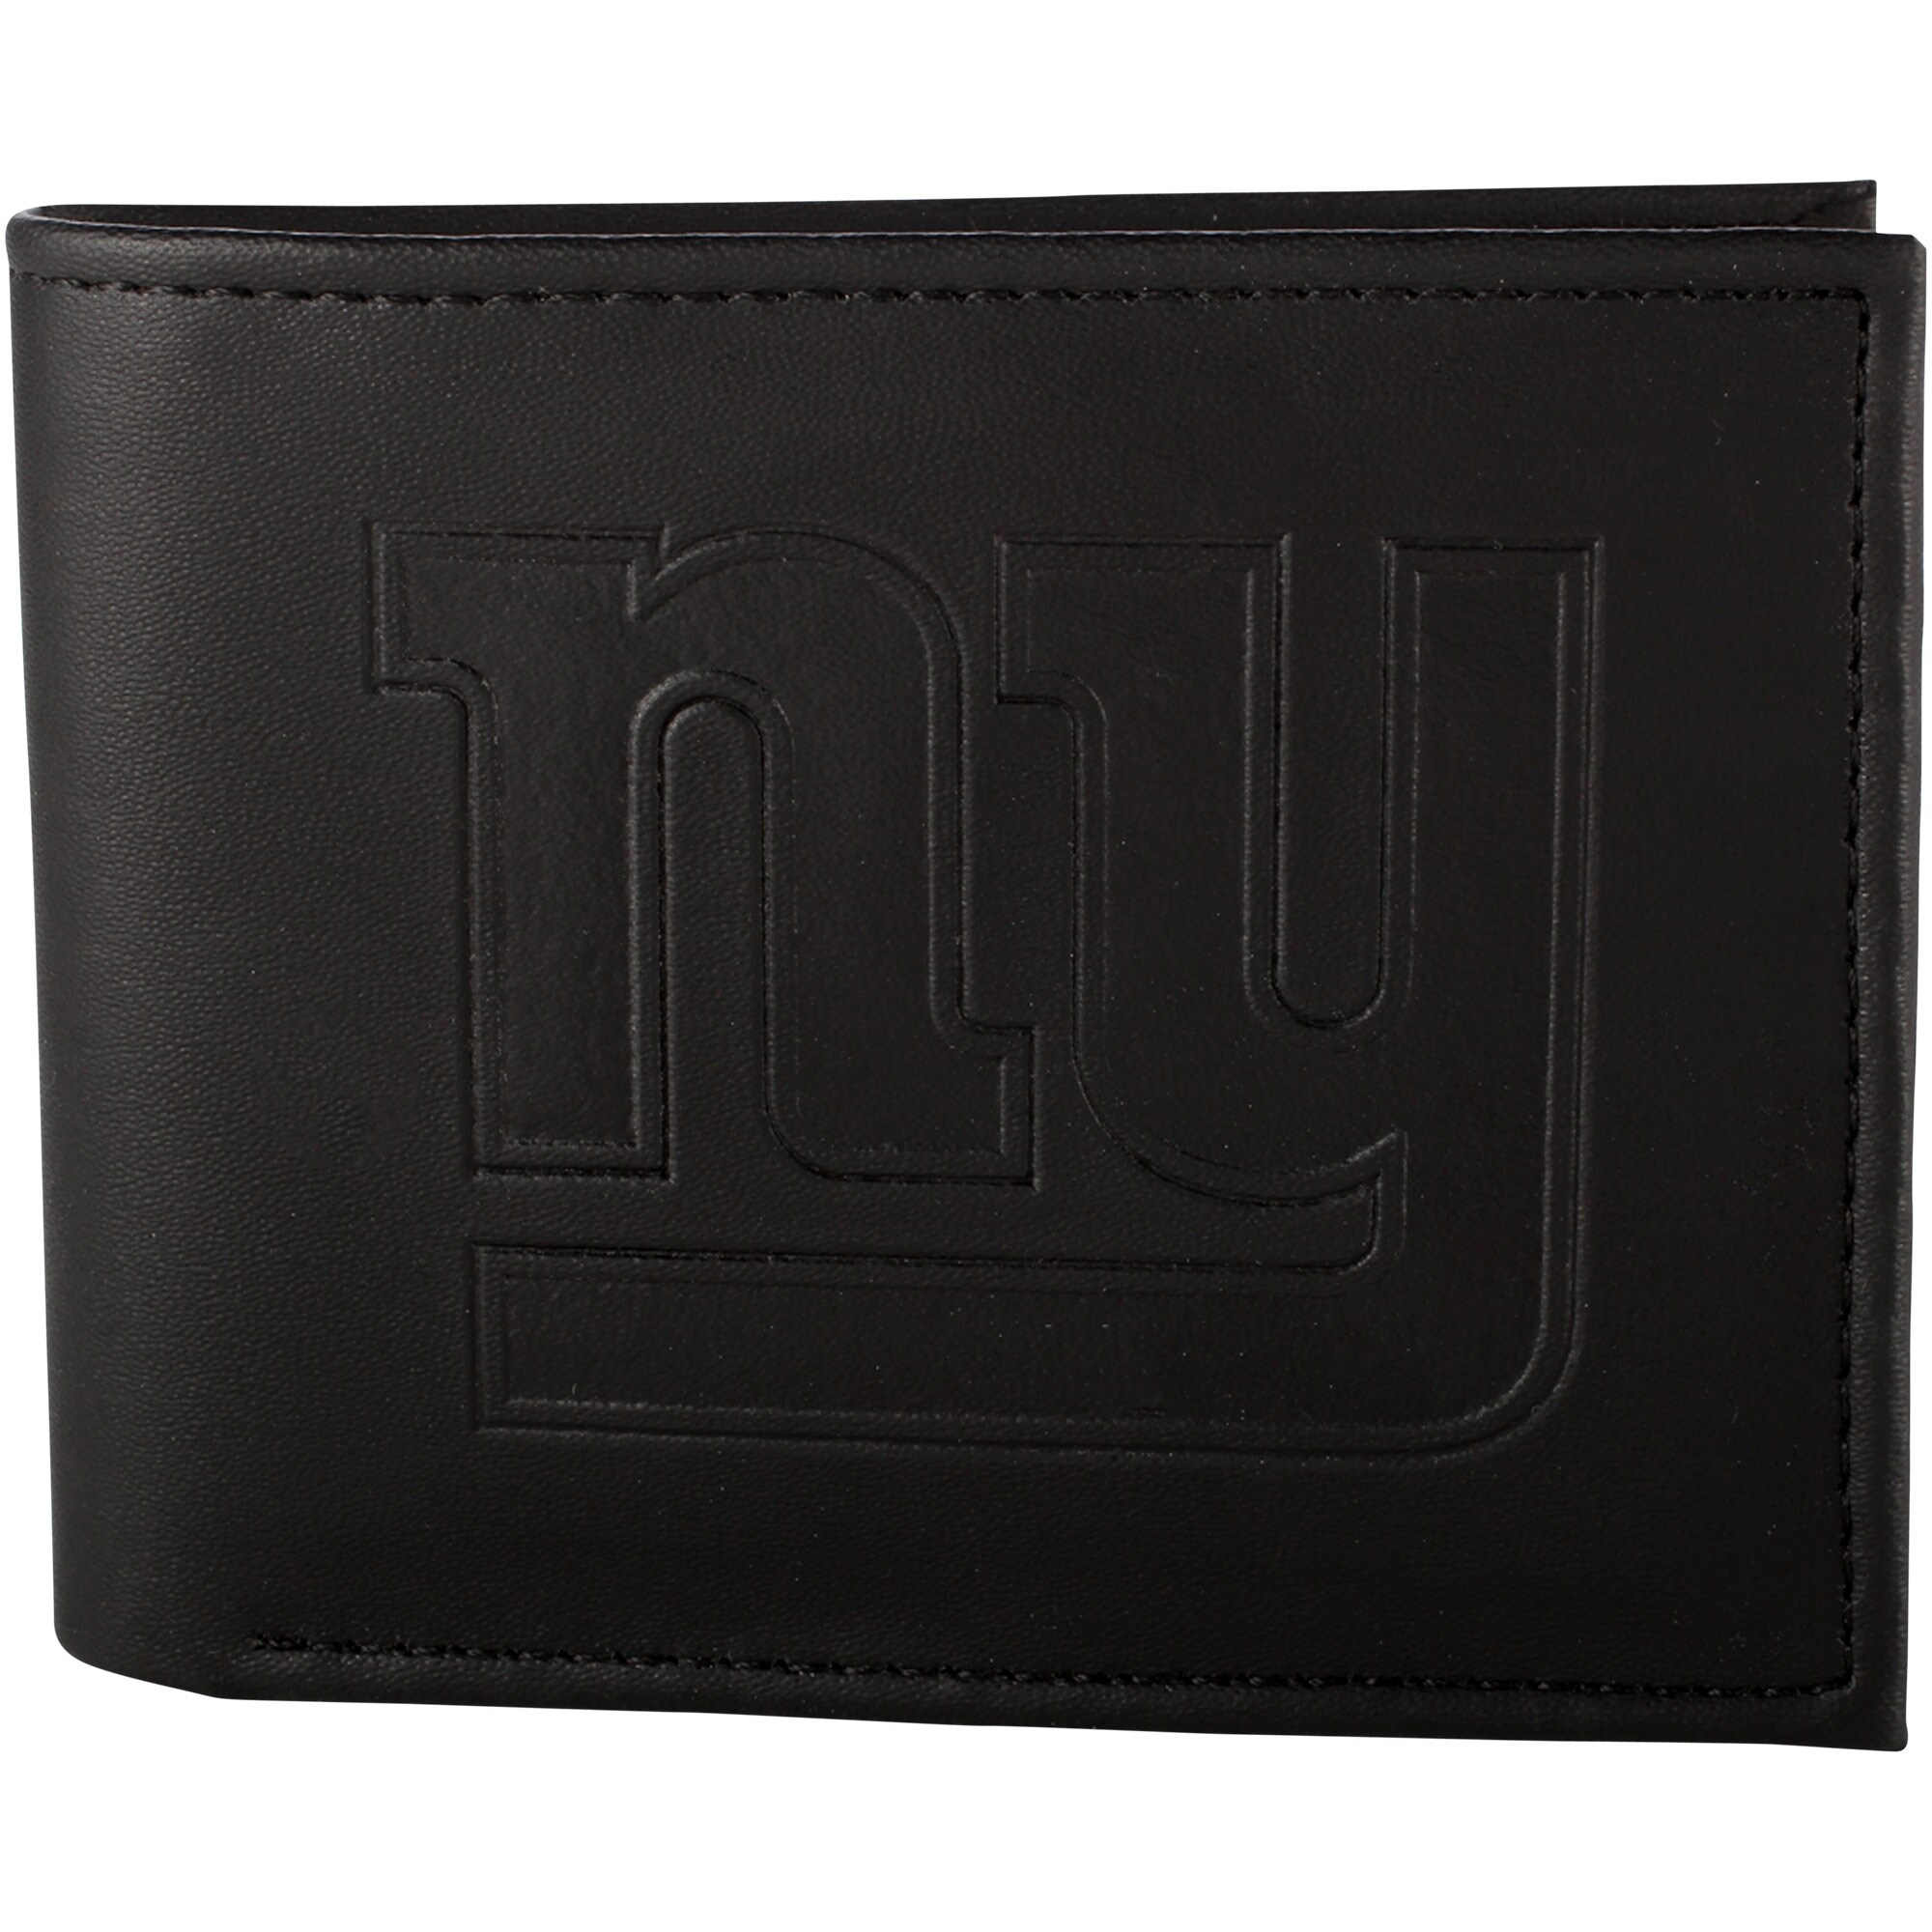 New York Giants Hybrid Bi-Fold Wallet - Black